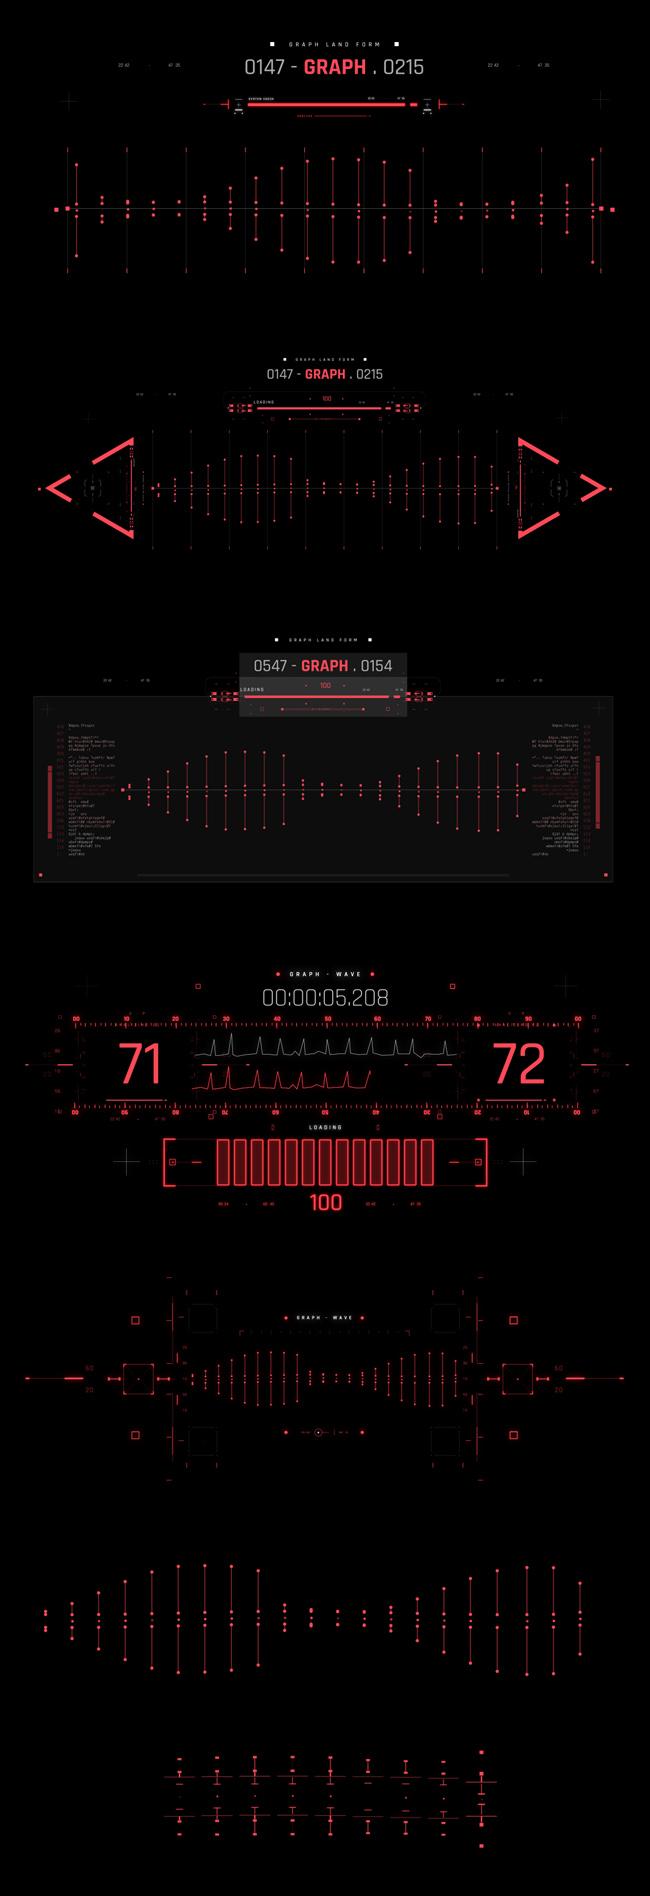 AE脚本-500个HUD高科技赛博朋克UI科幻界面元素动画预设包 Cyberpunk HUD UI 500+ 已修复中文版AE表达式报错插图27